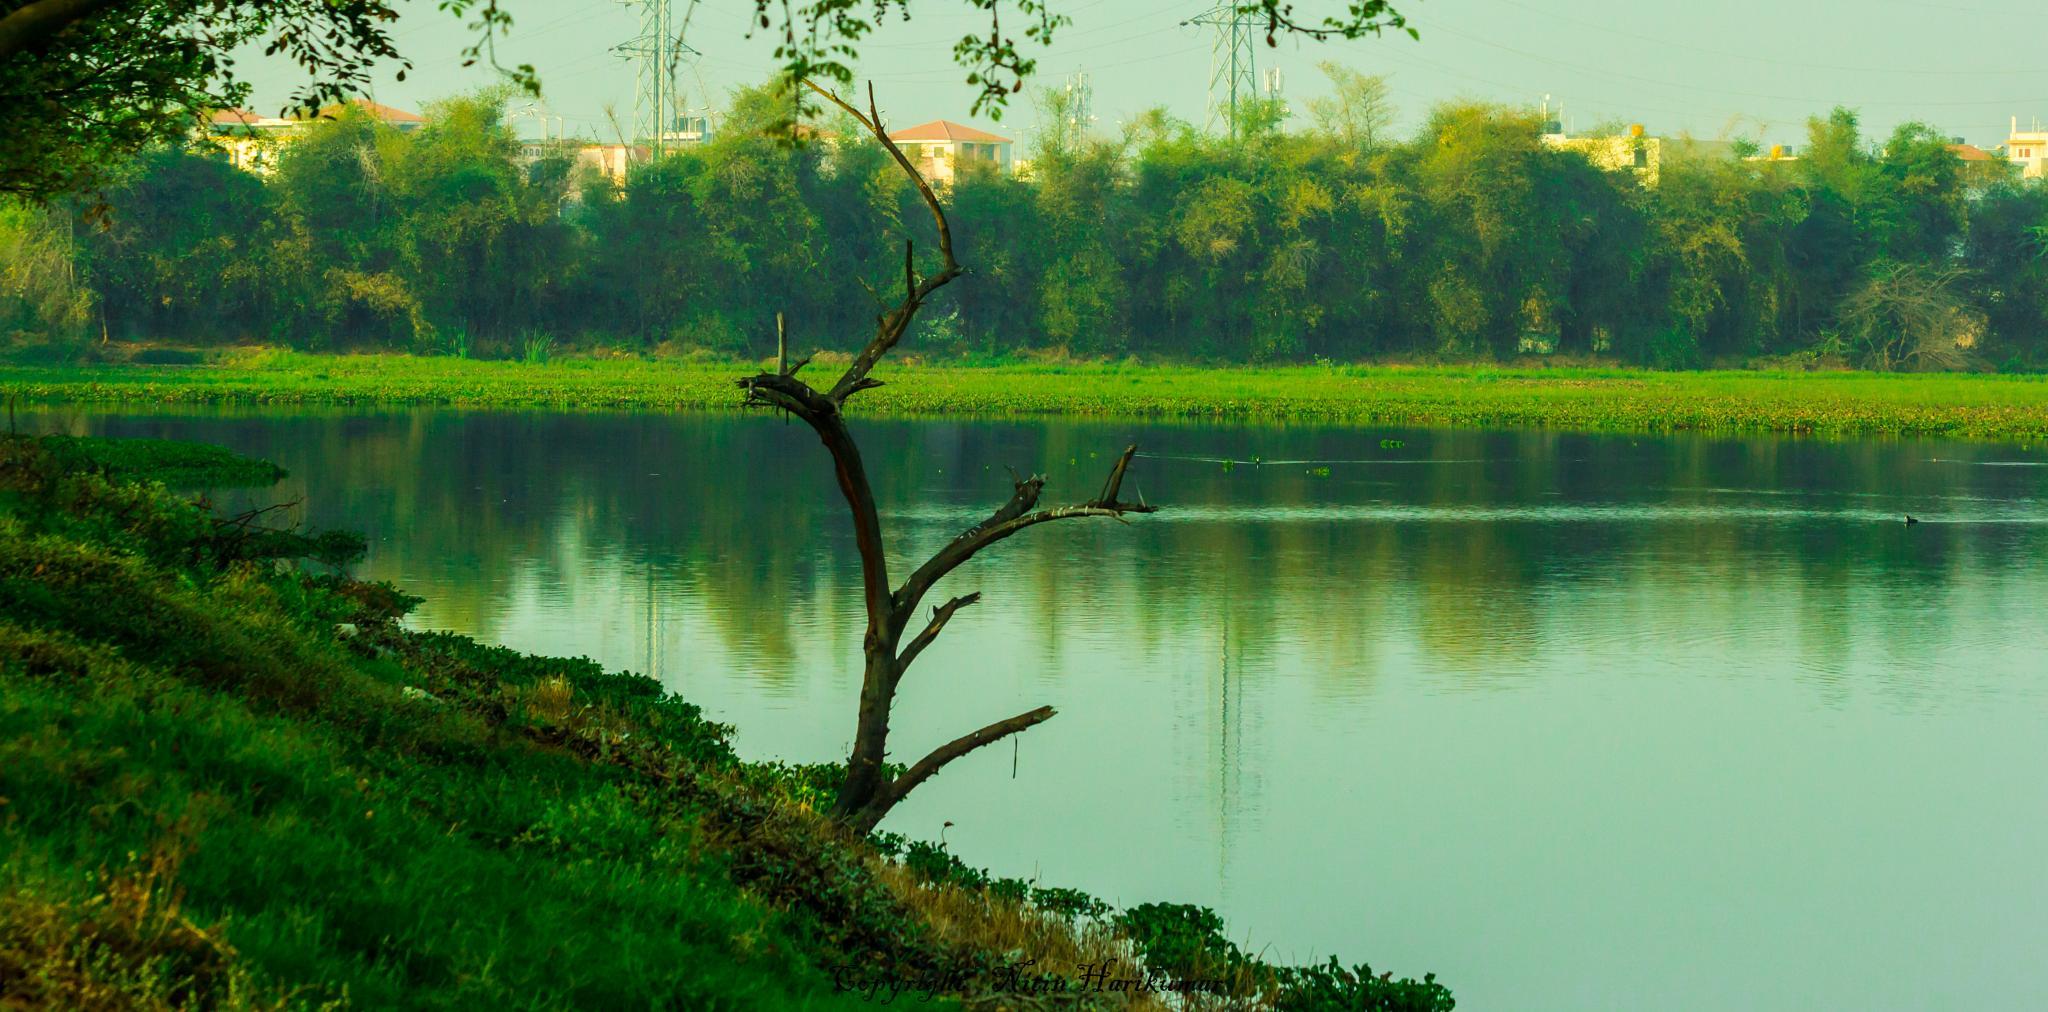 lake by Nitin Harikumar